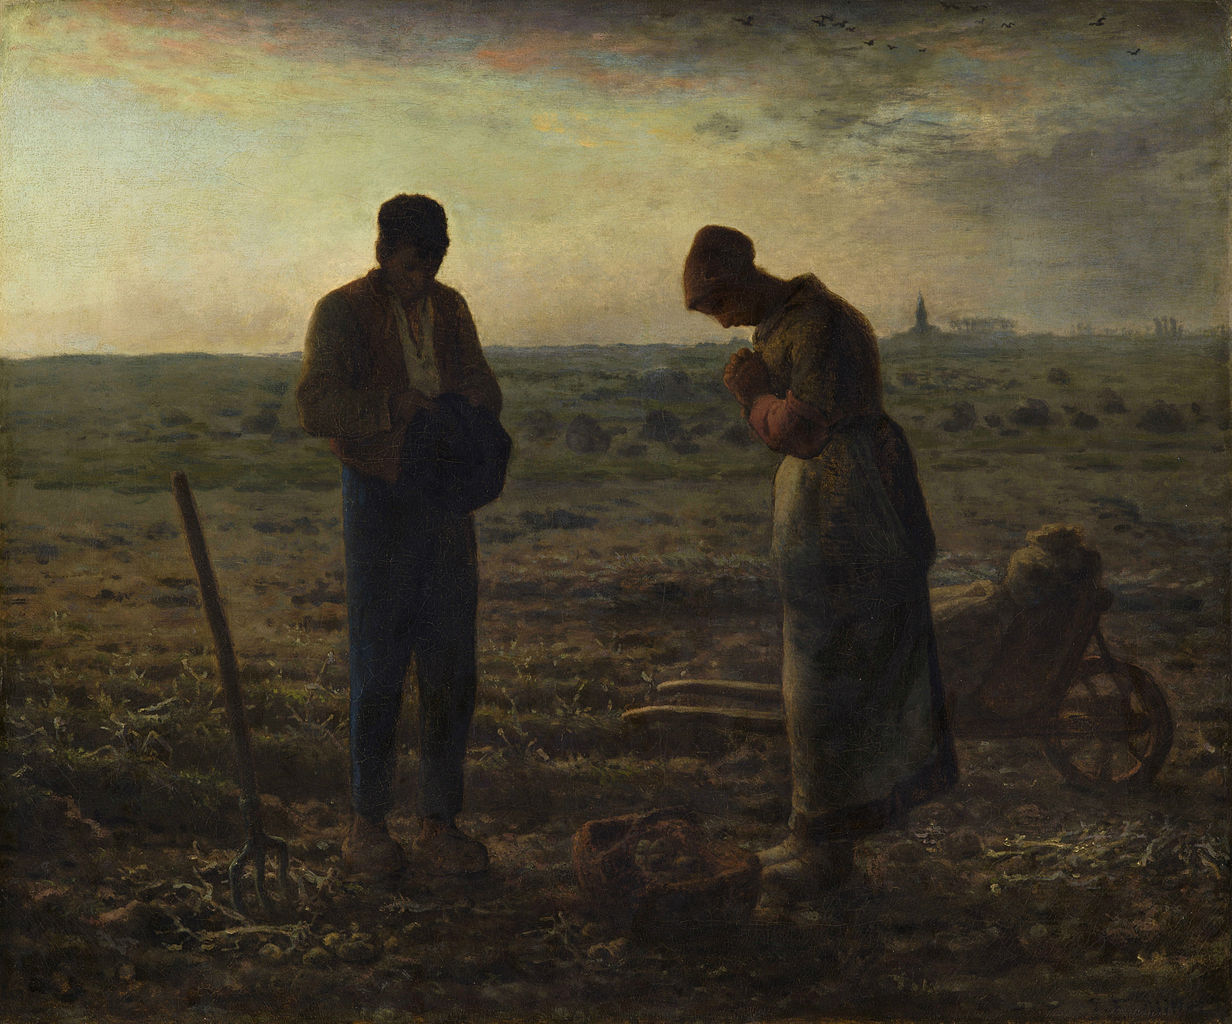 Jean-François Millet. The Angelus, 1857-1859.